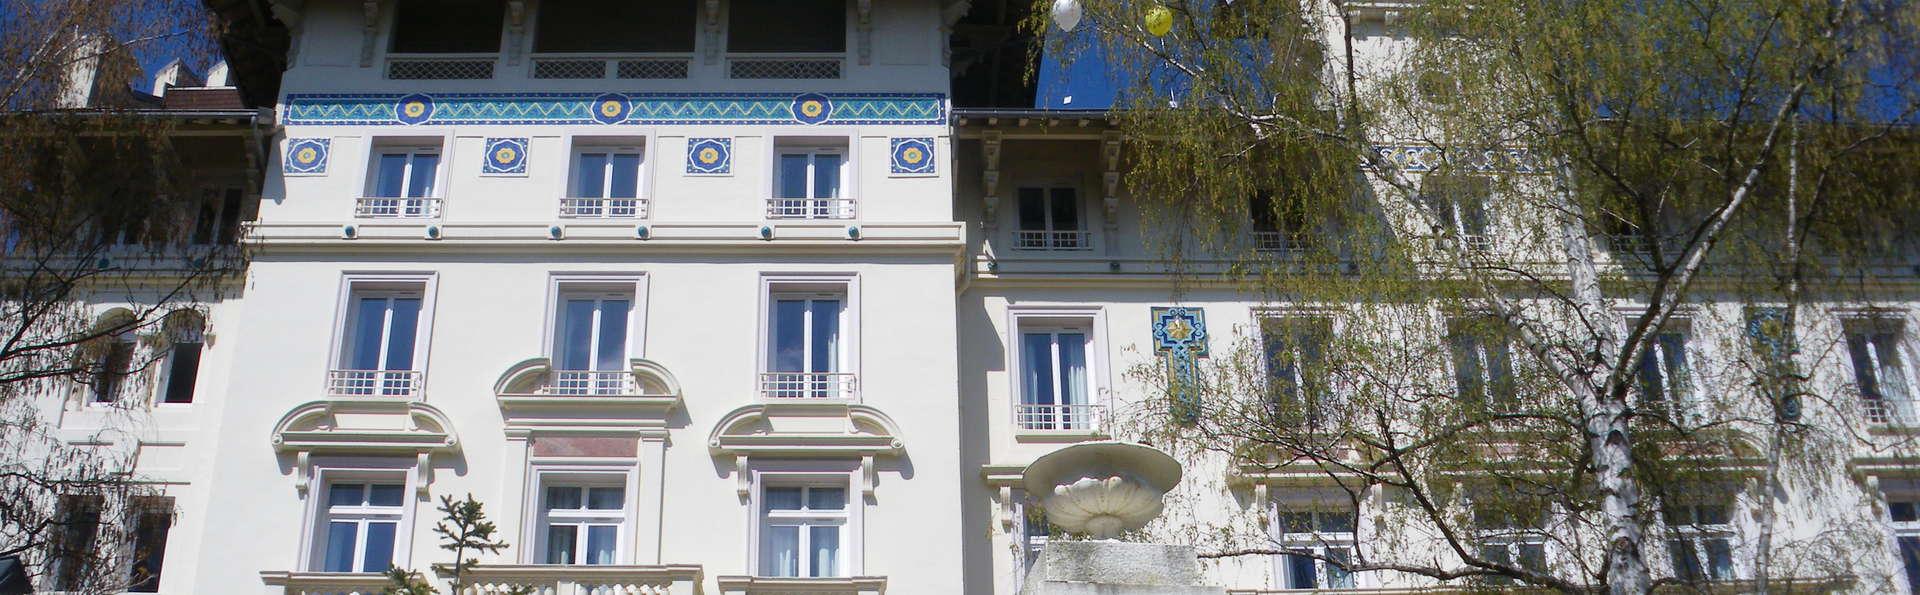 Hôtel Le Splendid - Chatelguyon - IMGP0013.JPG